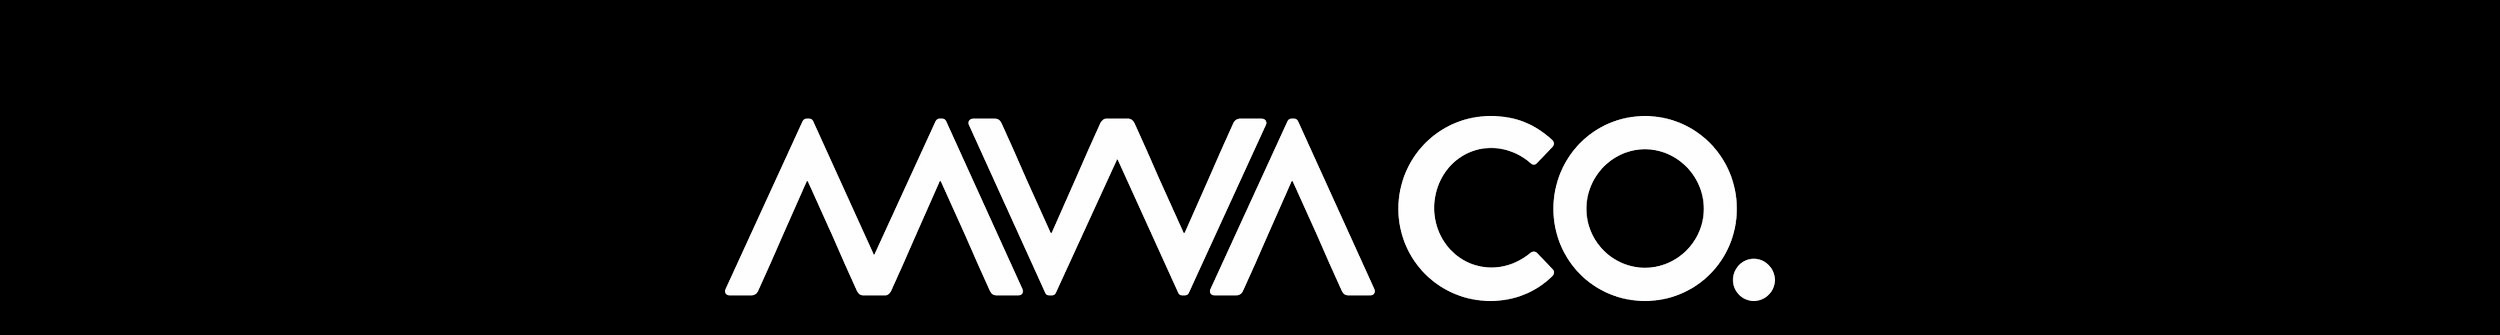 MWA_FNL-logo A-white-on-black.jpg